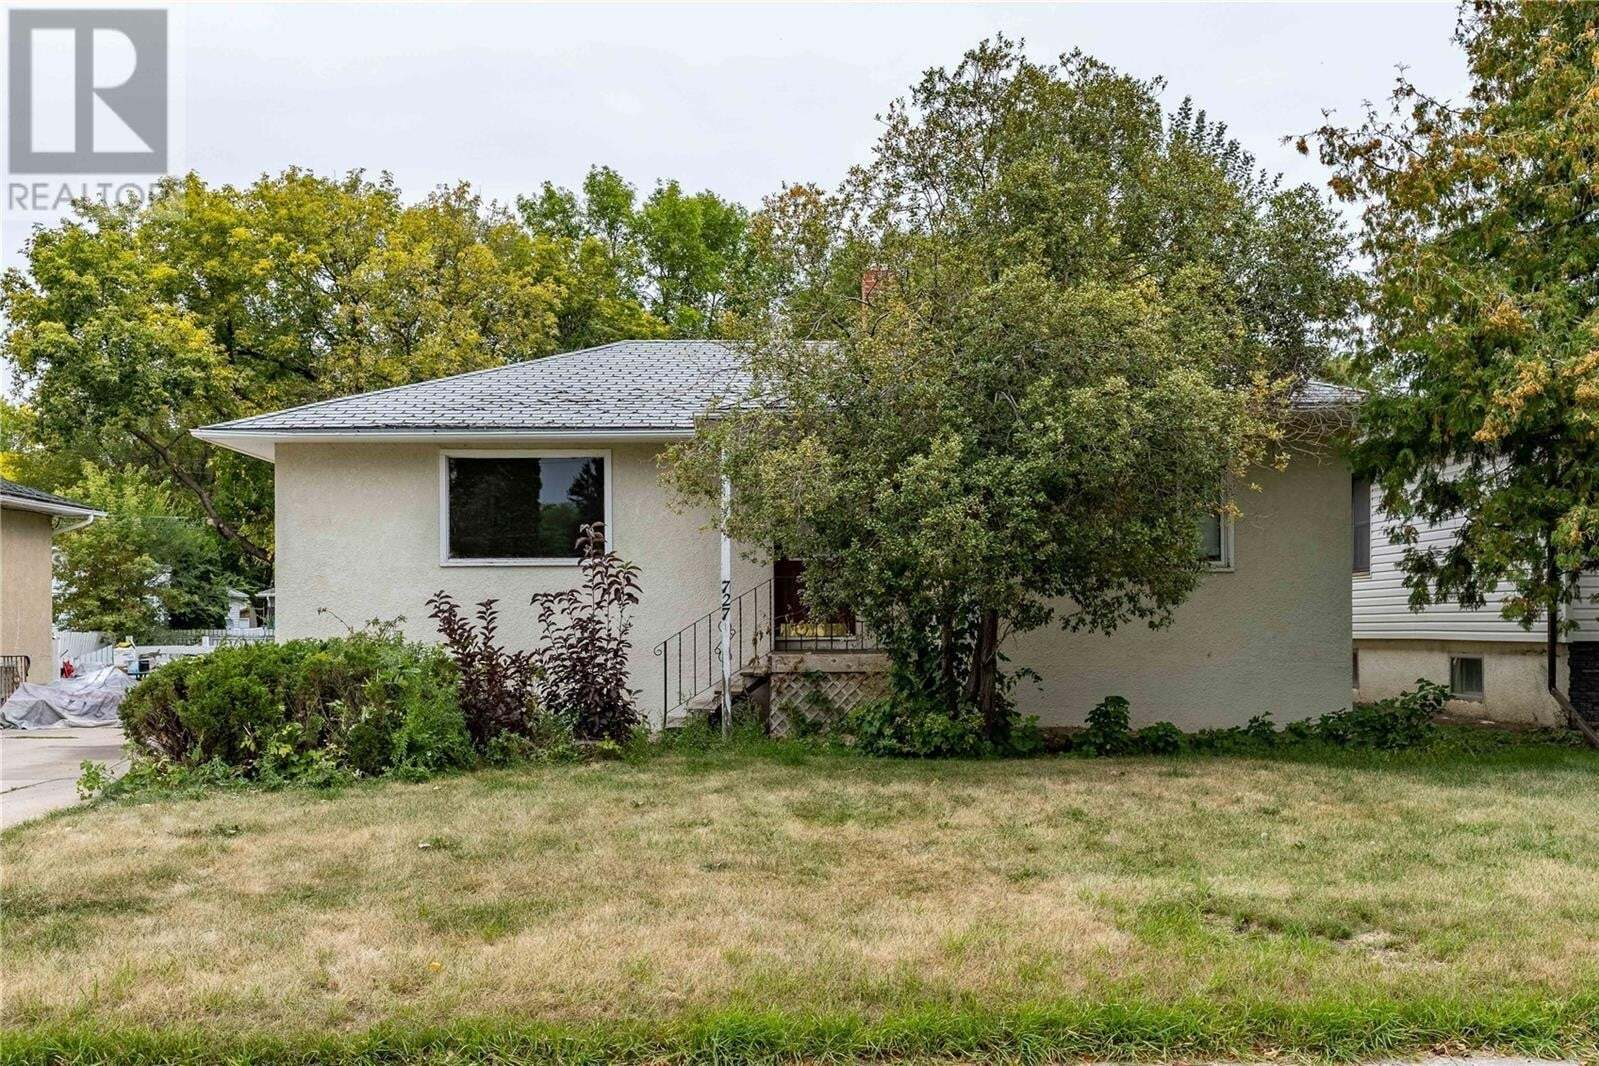 House for sale at 727 3rd St E Saskatoon Saskatchewan - MLS: SK826847